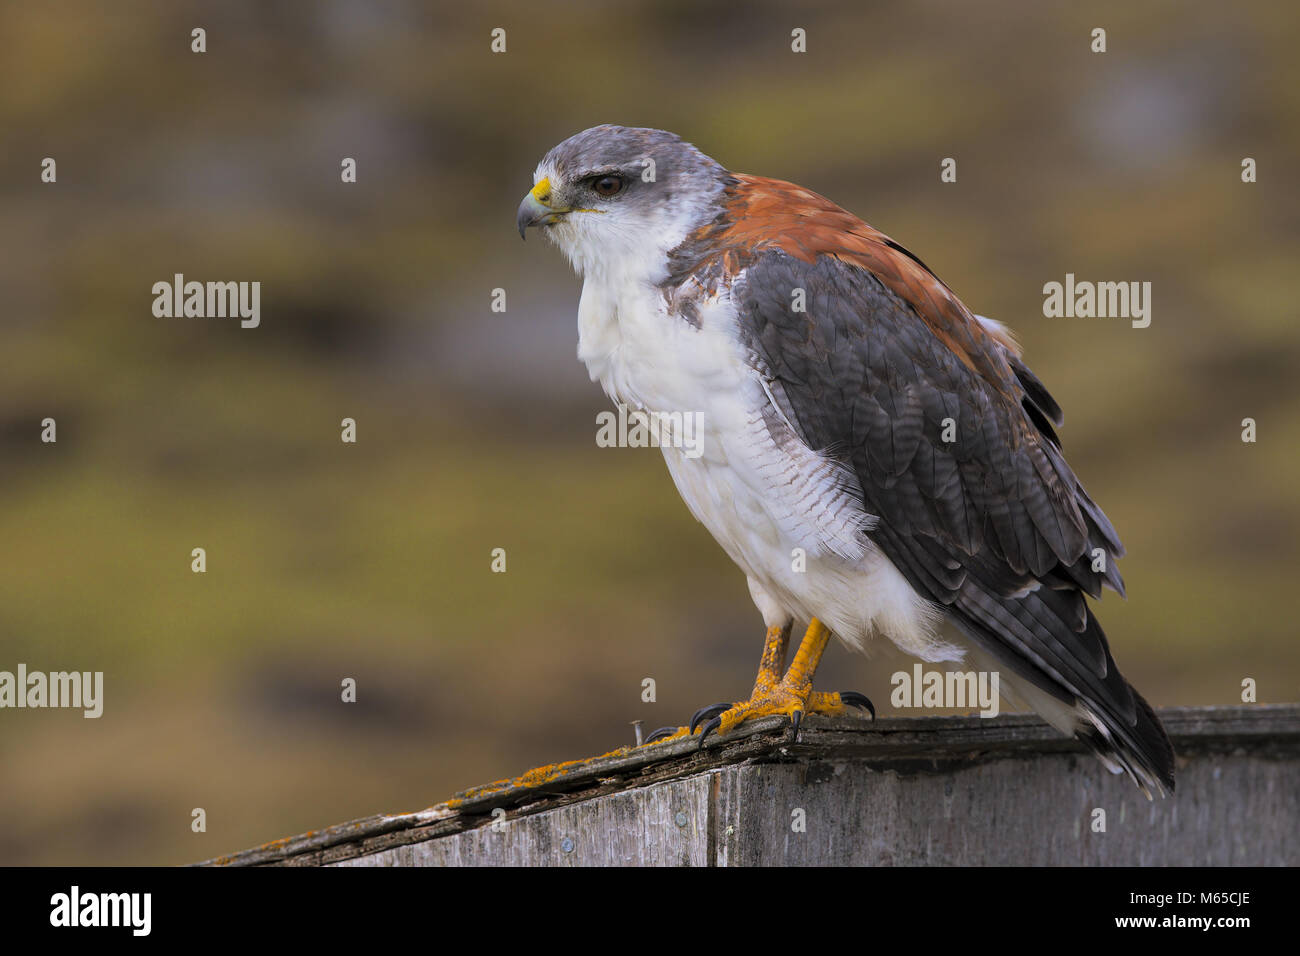 Variable Hawk - Stock Image